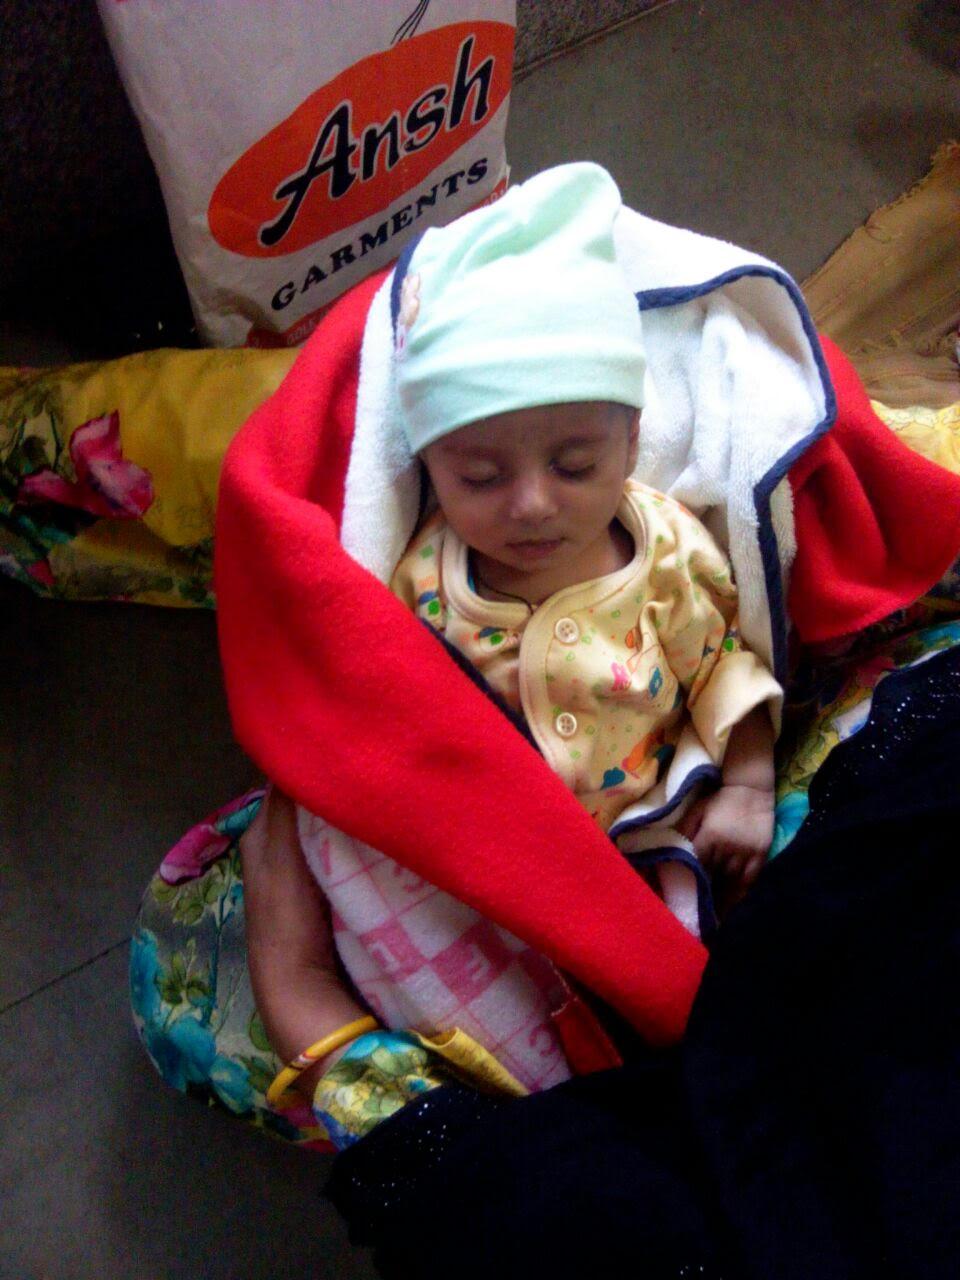 shubhan tof surgery